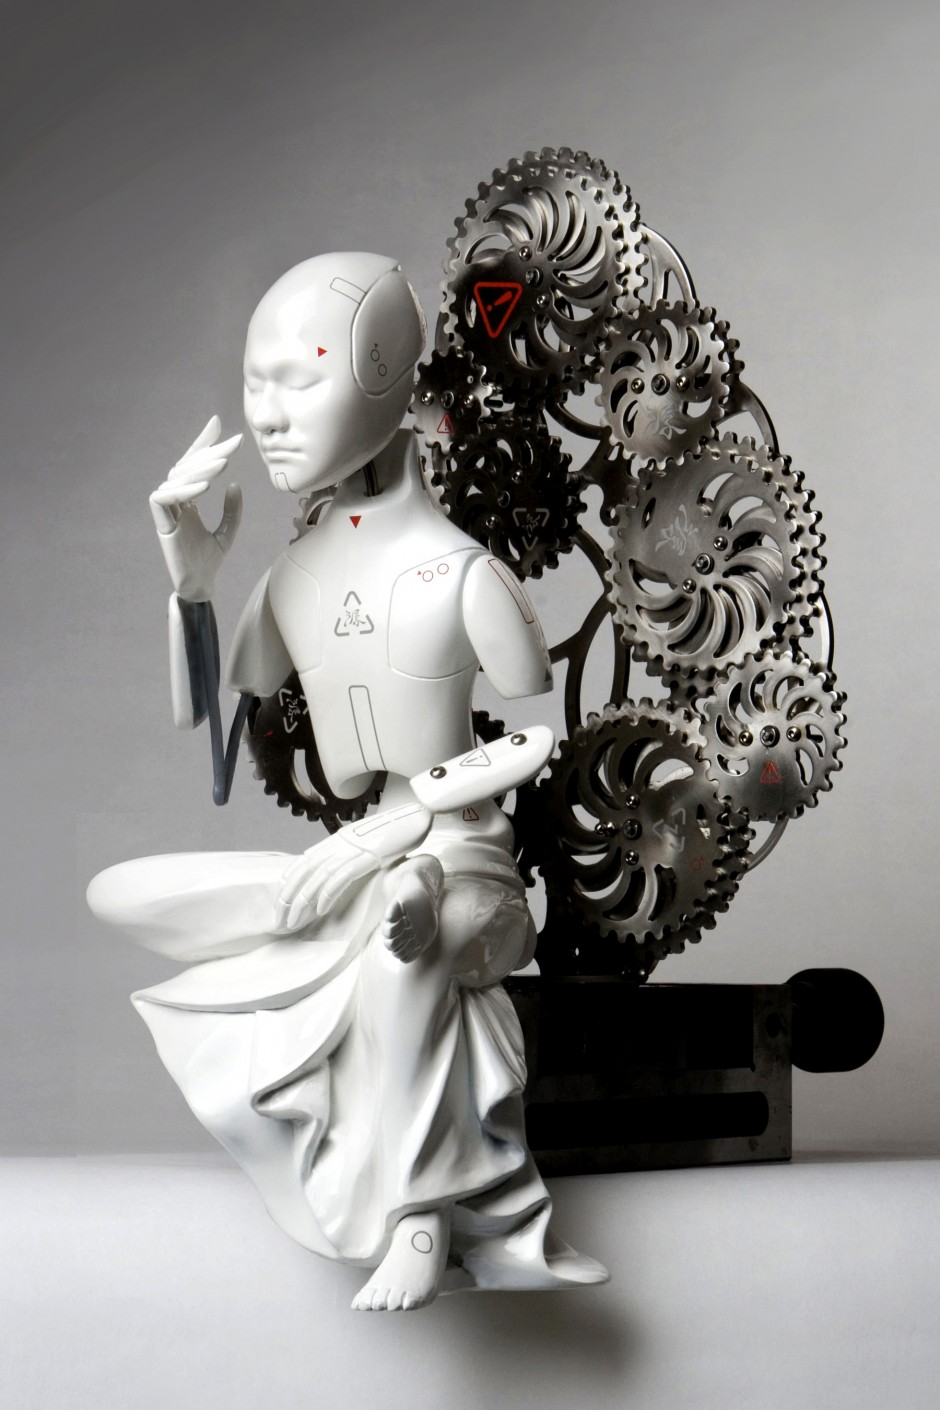 07-buddha_z__urethane, metallic material, machinery, electronic device (CPU board, motor)_size 40(h) x 230(w) x 20(d)cm_2009